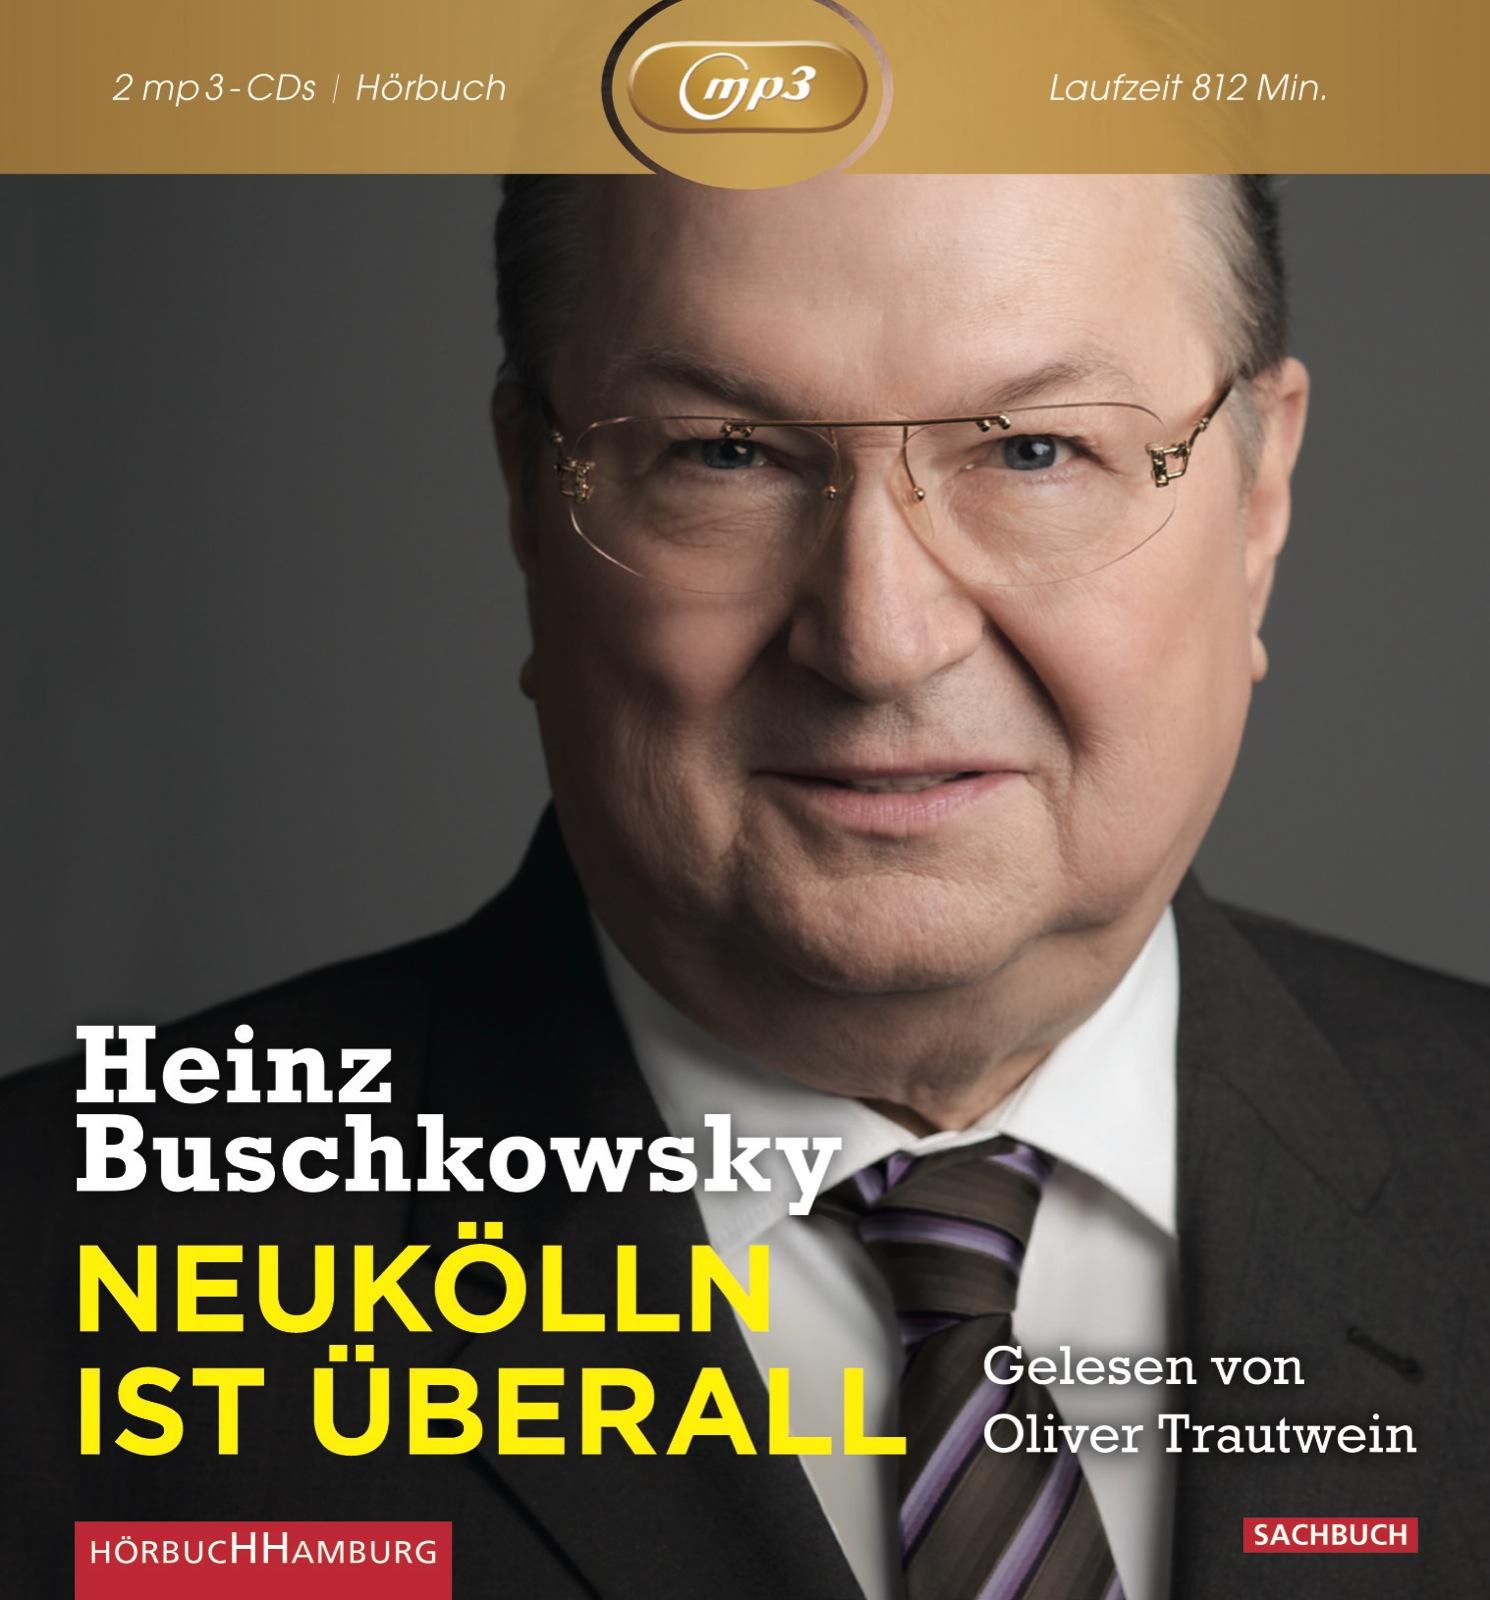 Neukölln ist überall - Heinz Buschkowsky [2 Mp3...